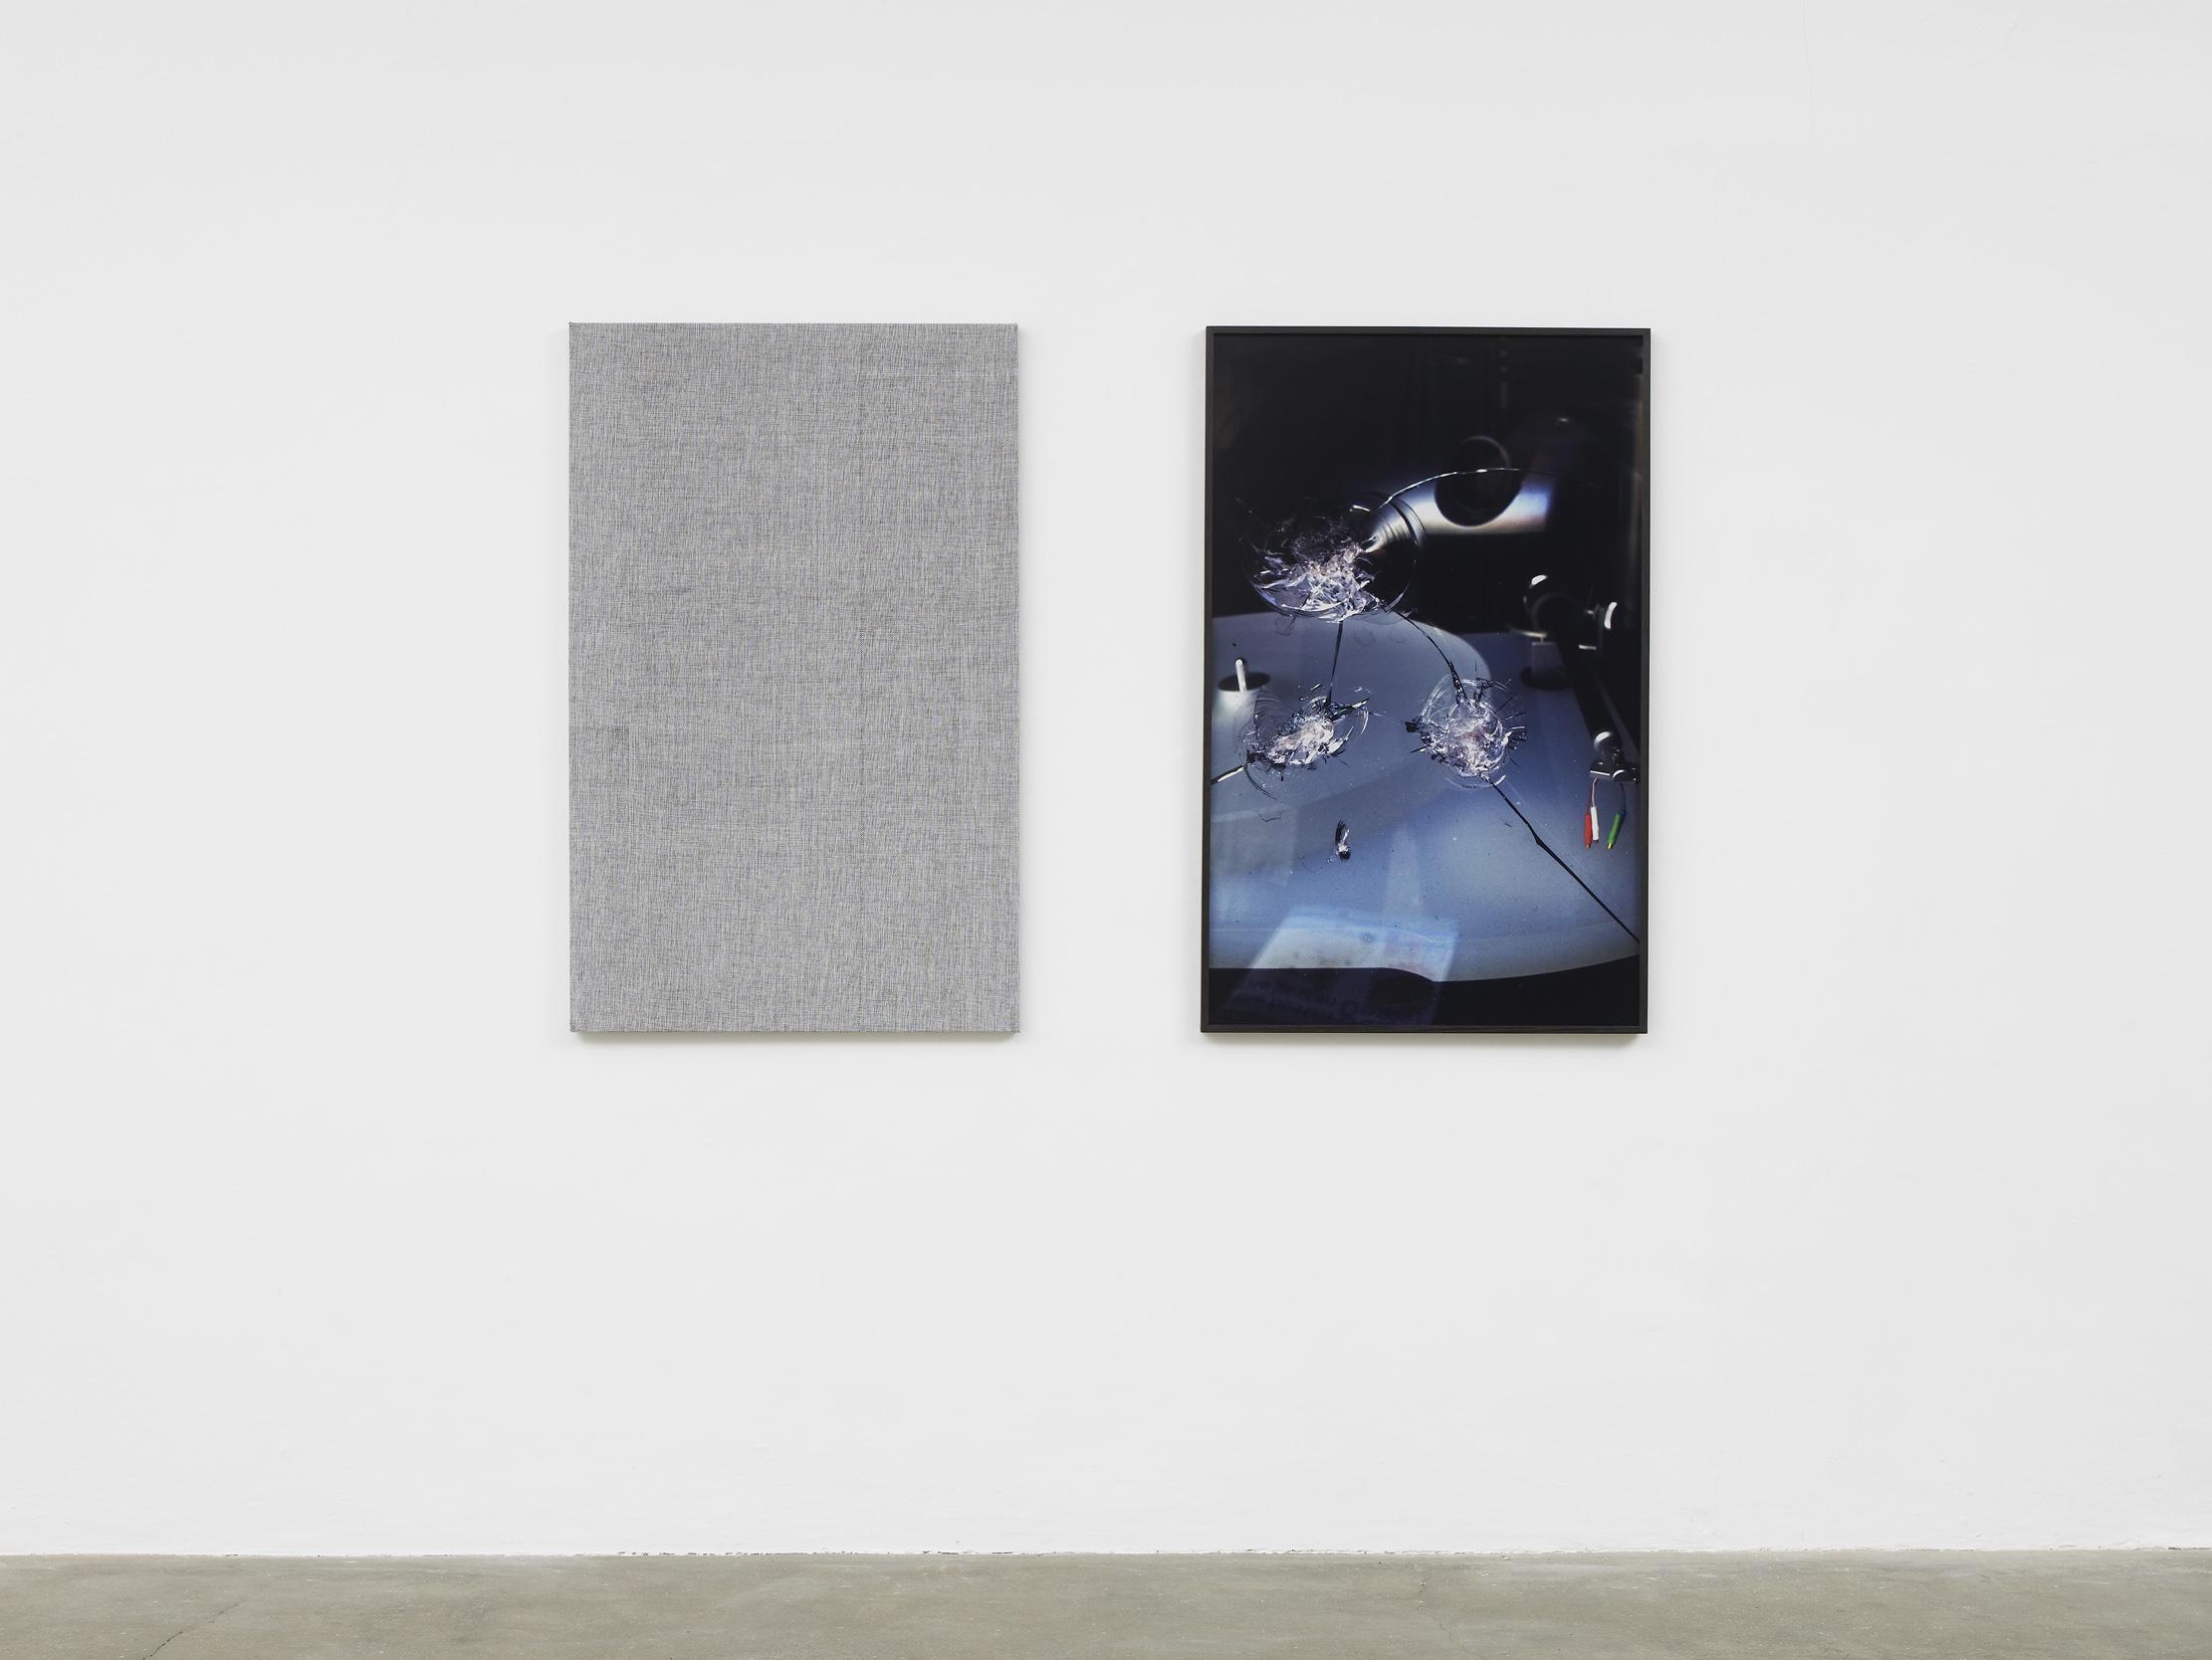 Installation View  Chisenhale Gallery, London, UK  2013